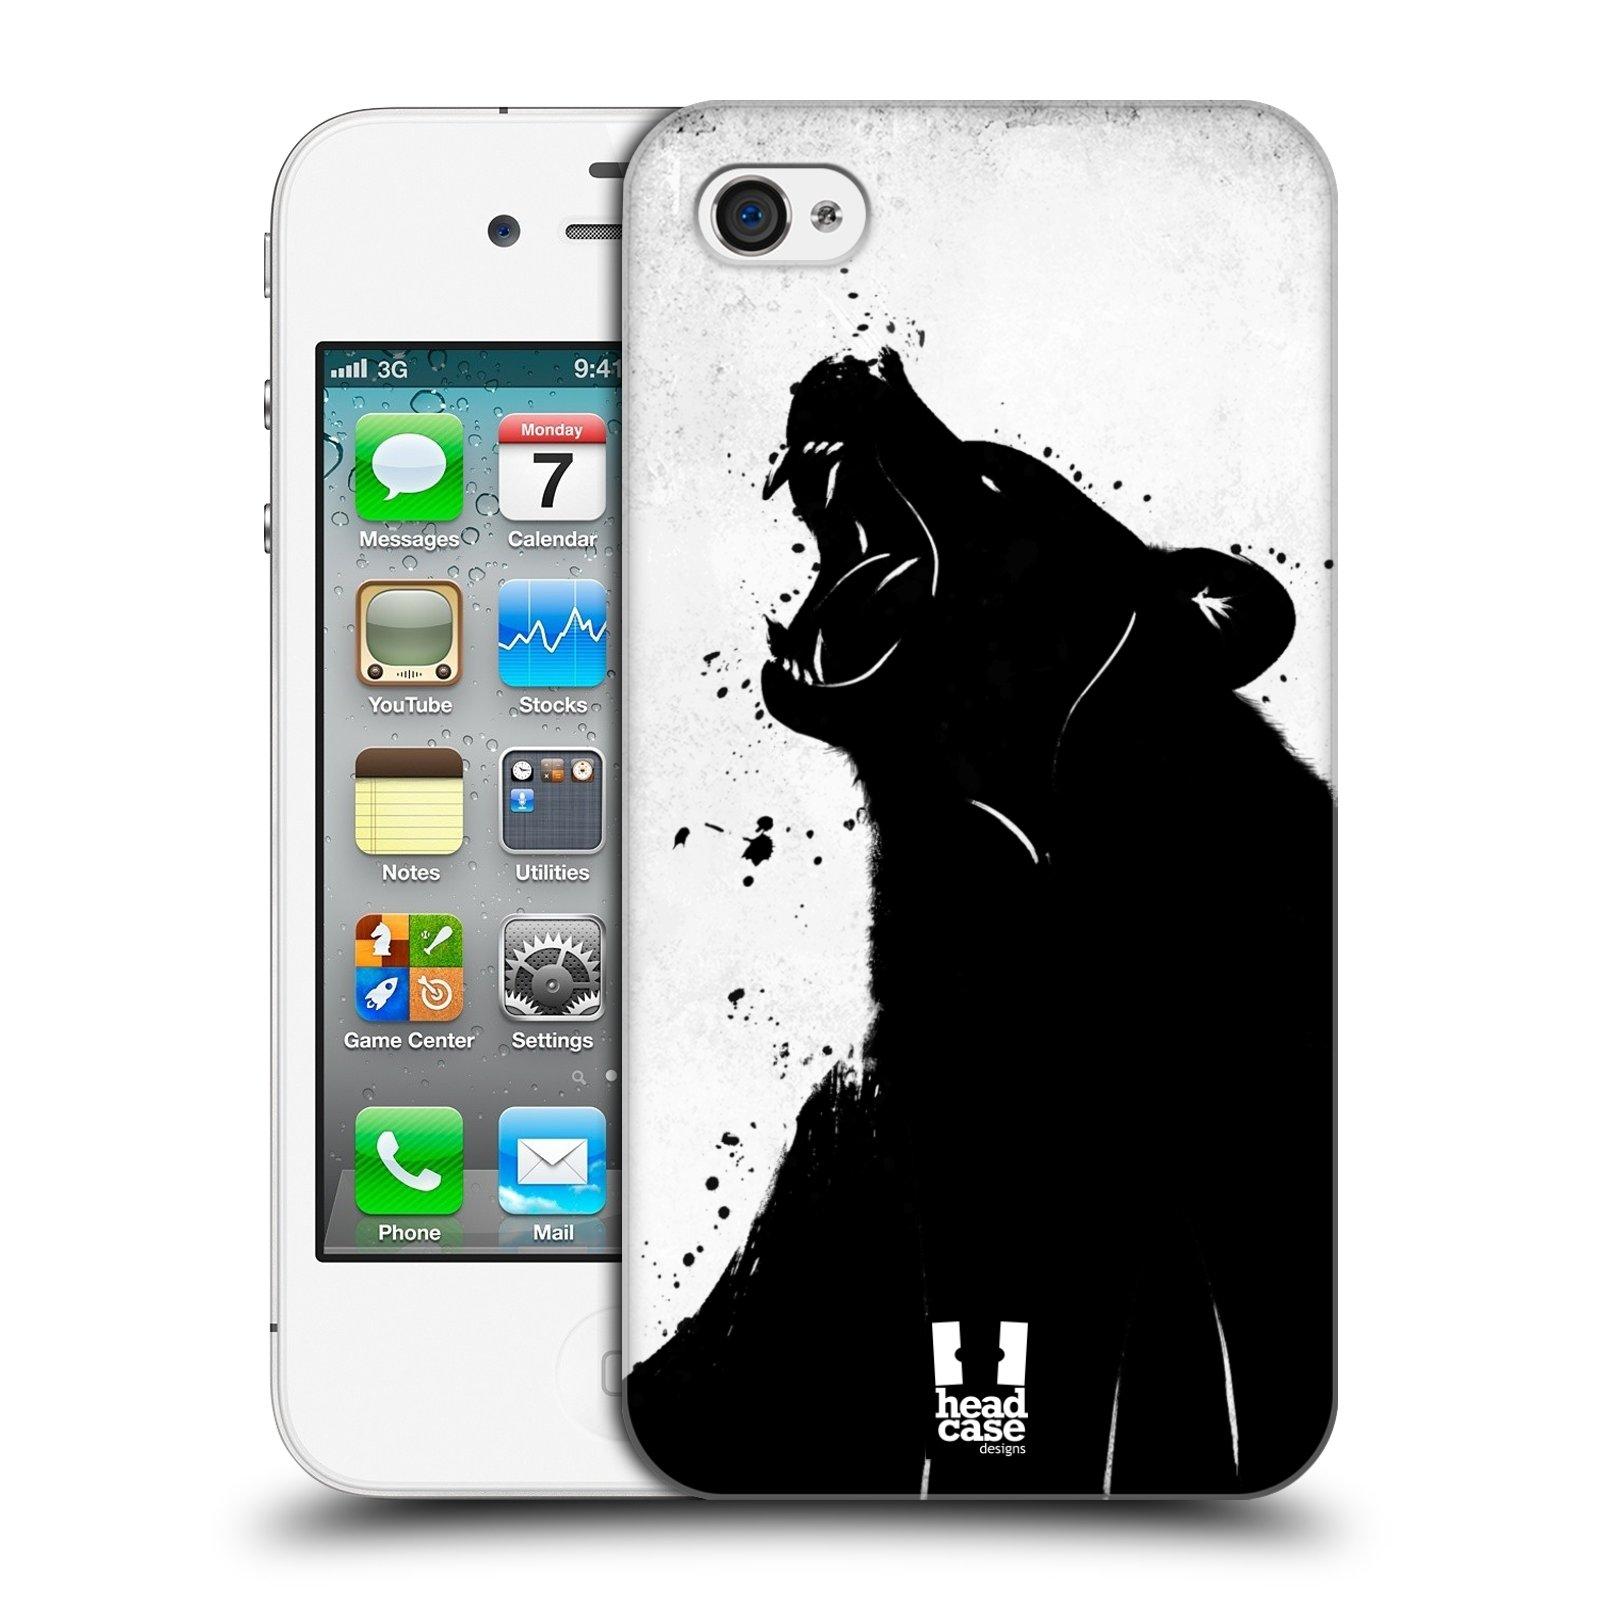 HEAD CASE plastový obal na mobil Apple Iphone 4/4S vzor Kresba tuš zvíře medvěd